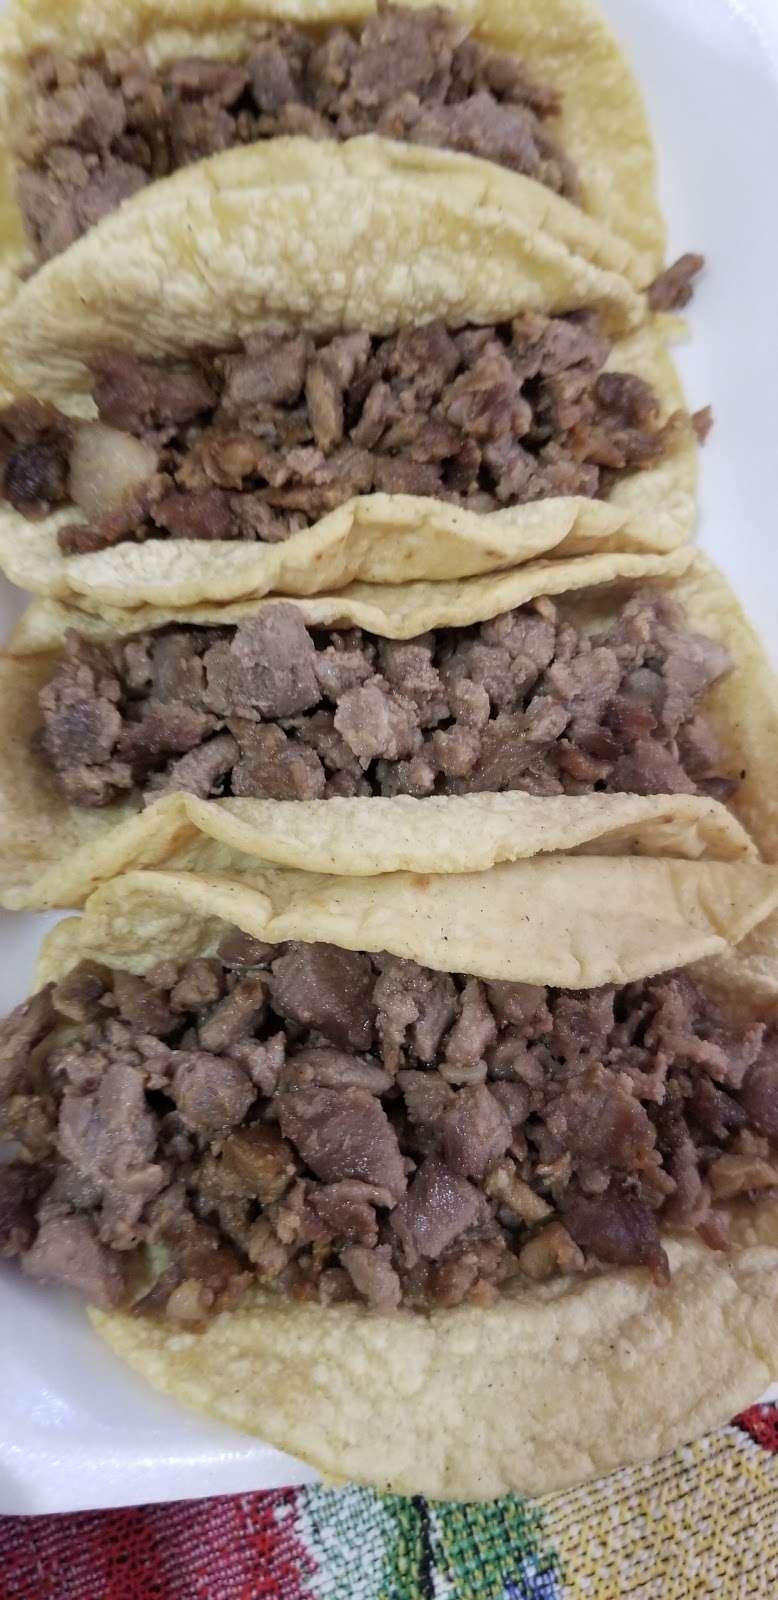 Carnitas Don Cuco - restaurant  | Photo 6 of 10 | Address: 10981 Glenoaks Blvd, Pacoima, CA 91331, USA | Phone: (747) 225-0825